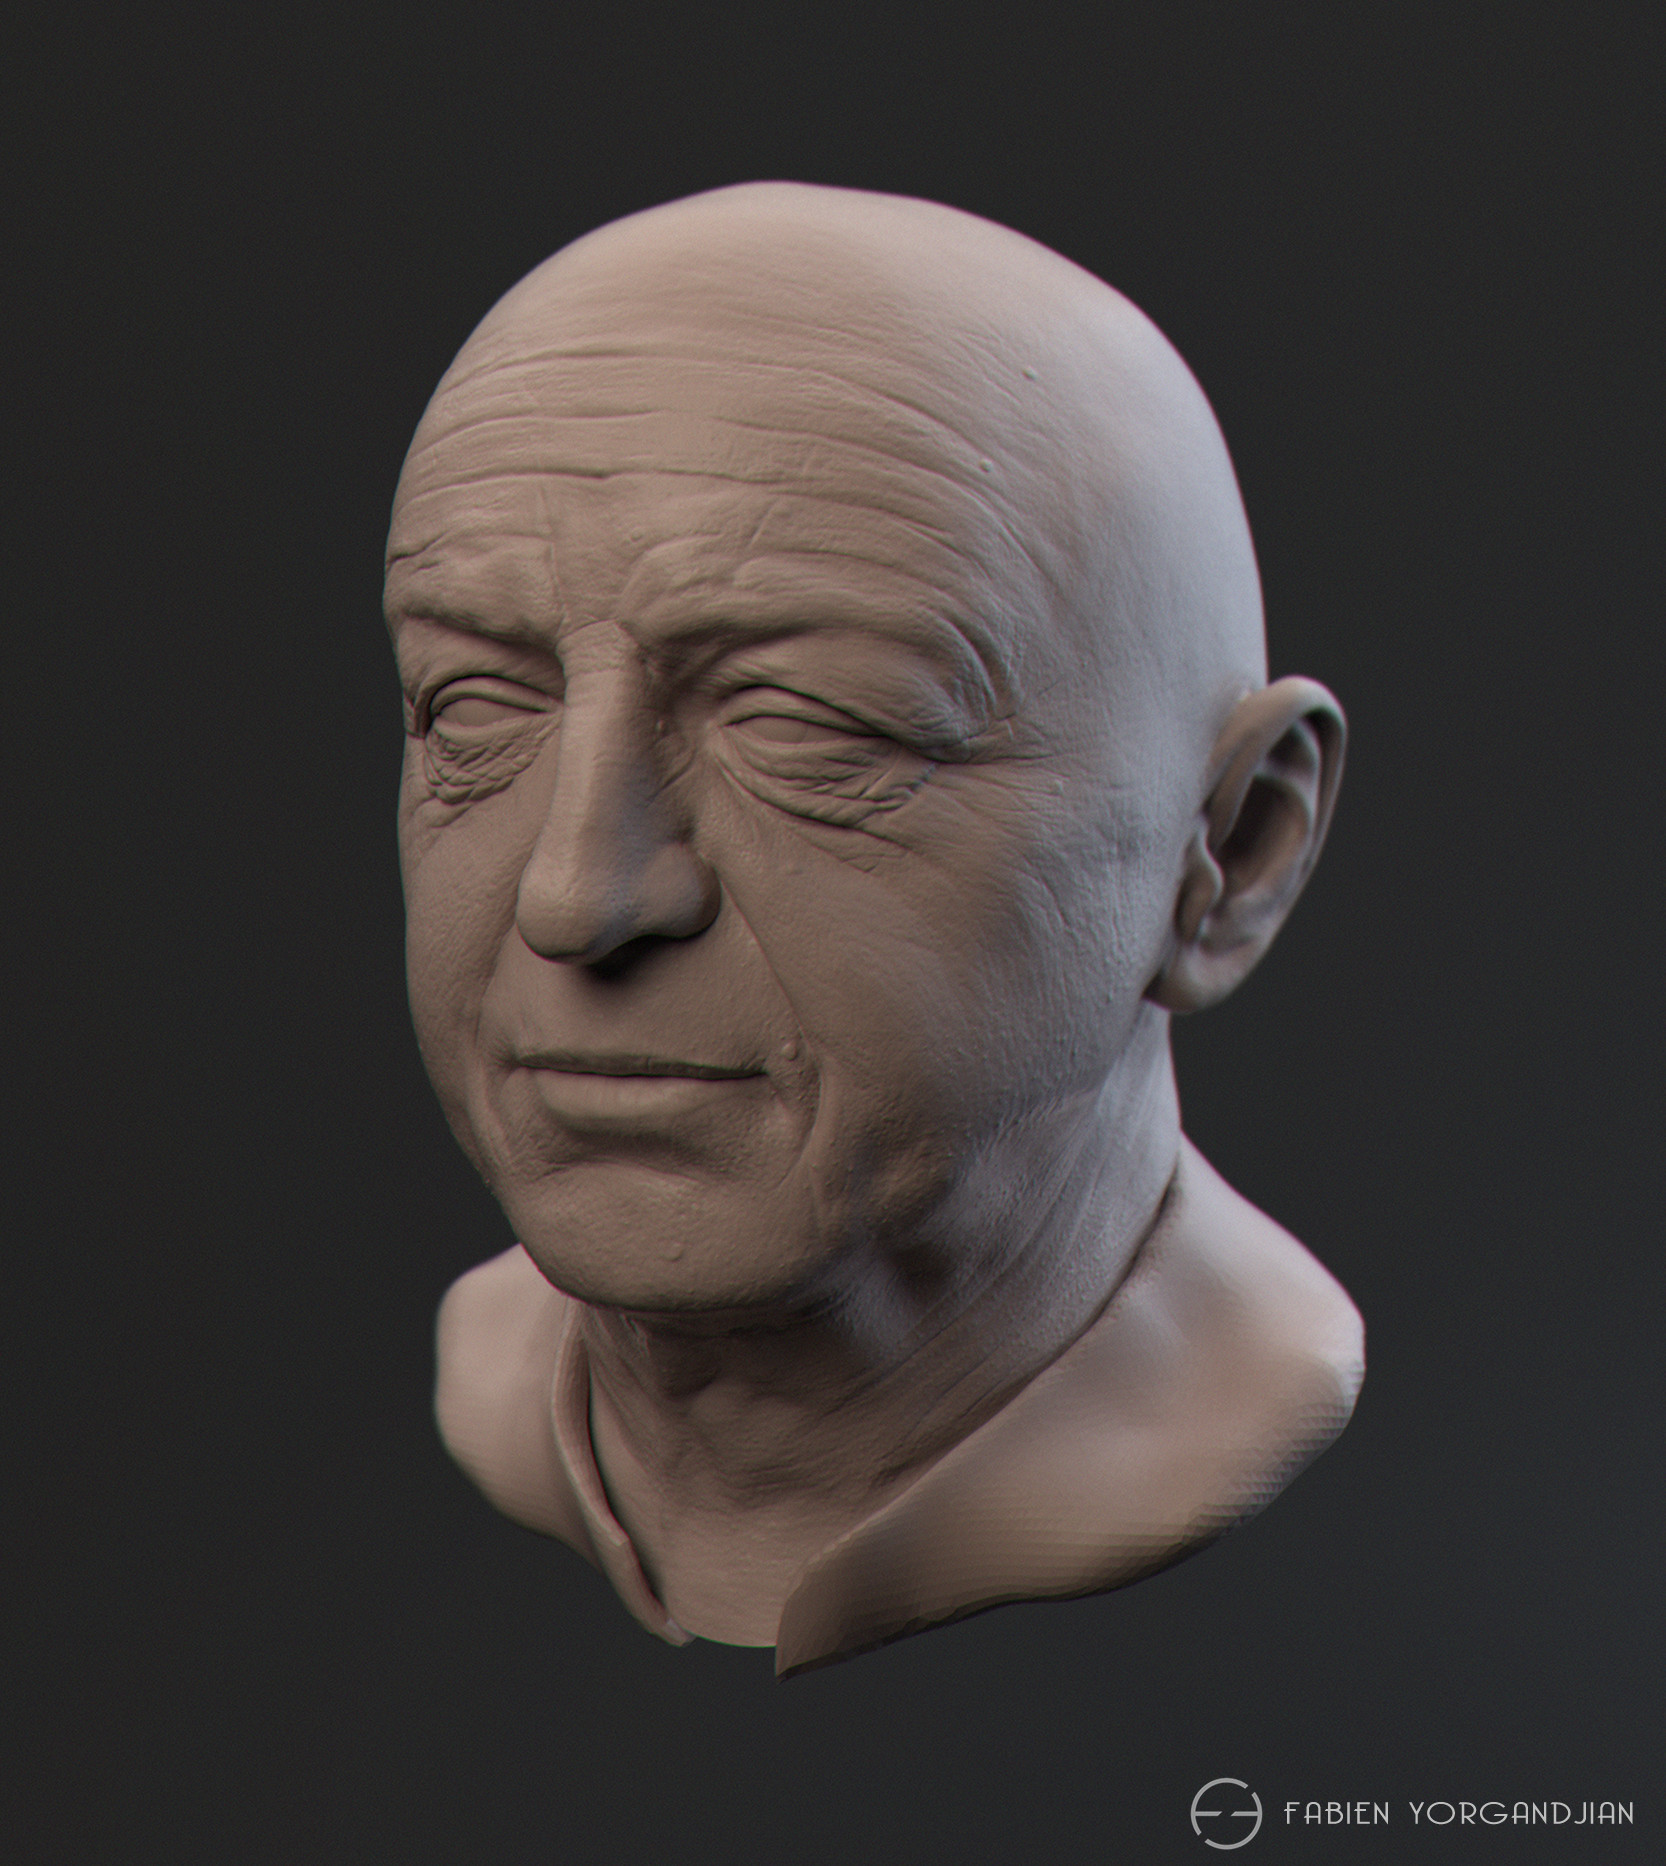 Fabien yorgandjian head 06 02